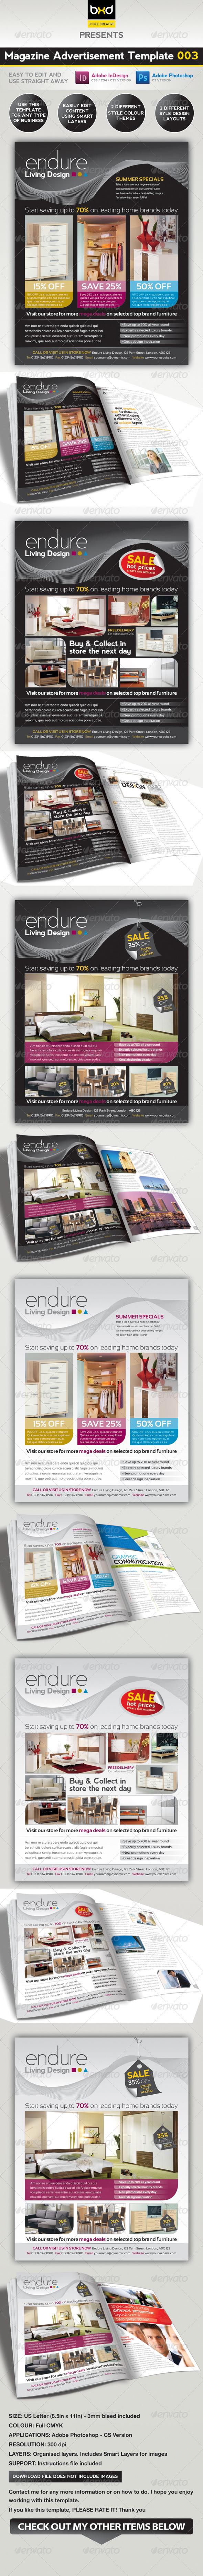 Magazine Advert Template 003 - Corporate Flyers